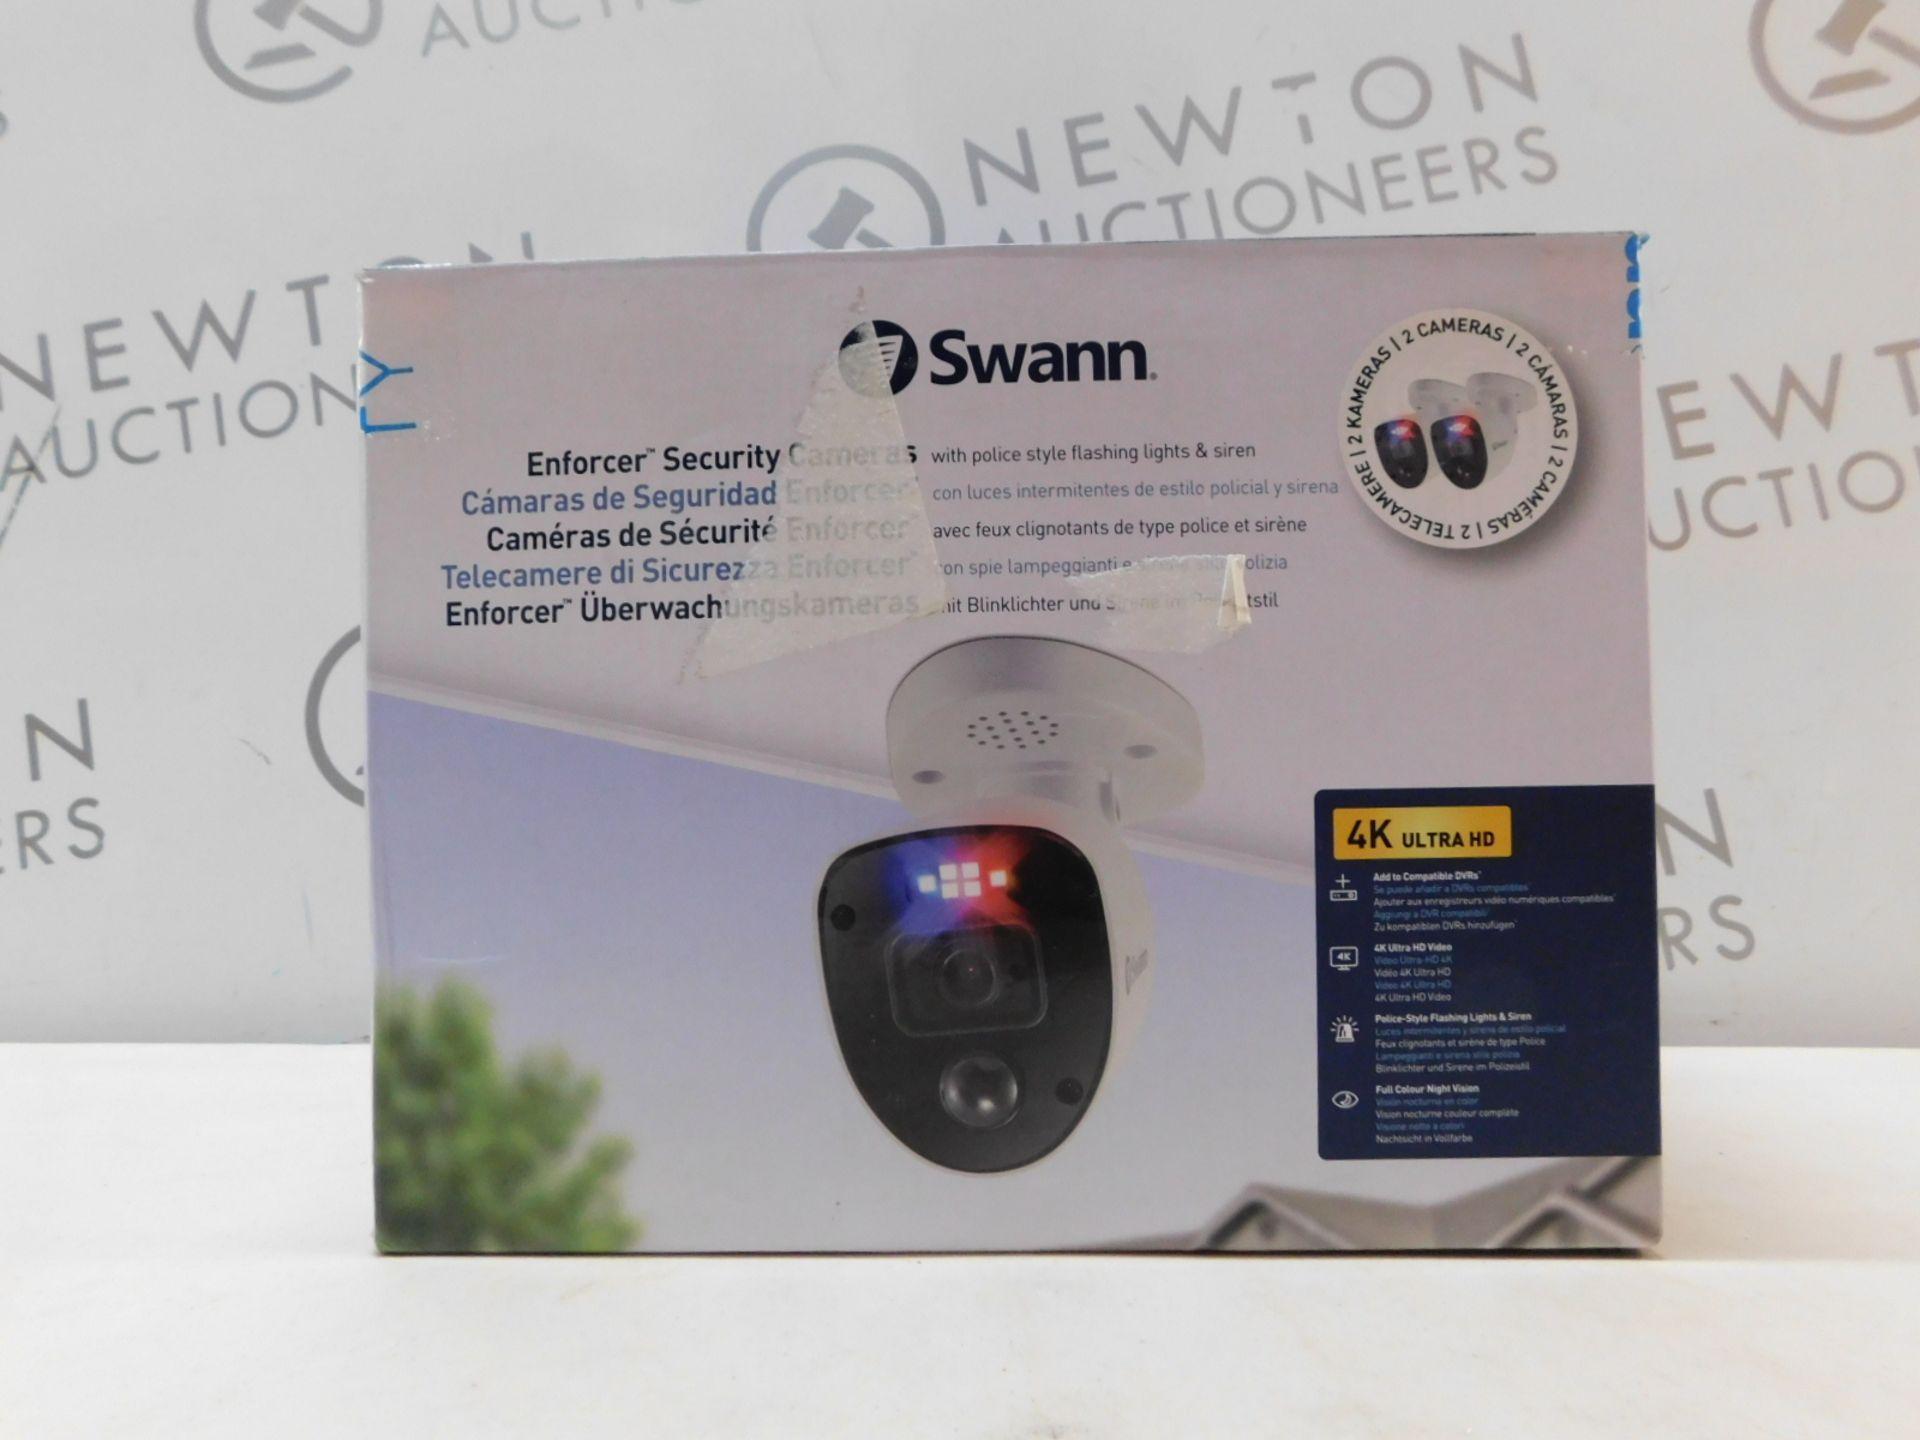 1 BOXED SWANN ENFORCER SWPRO-1080SLPK2-EU FULL HD ADD-ON SECURITY CAMERAS - 2 CAMERAS RRP £99